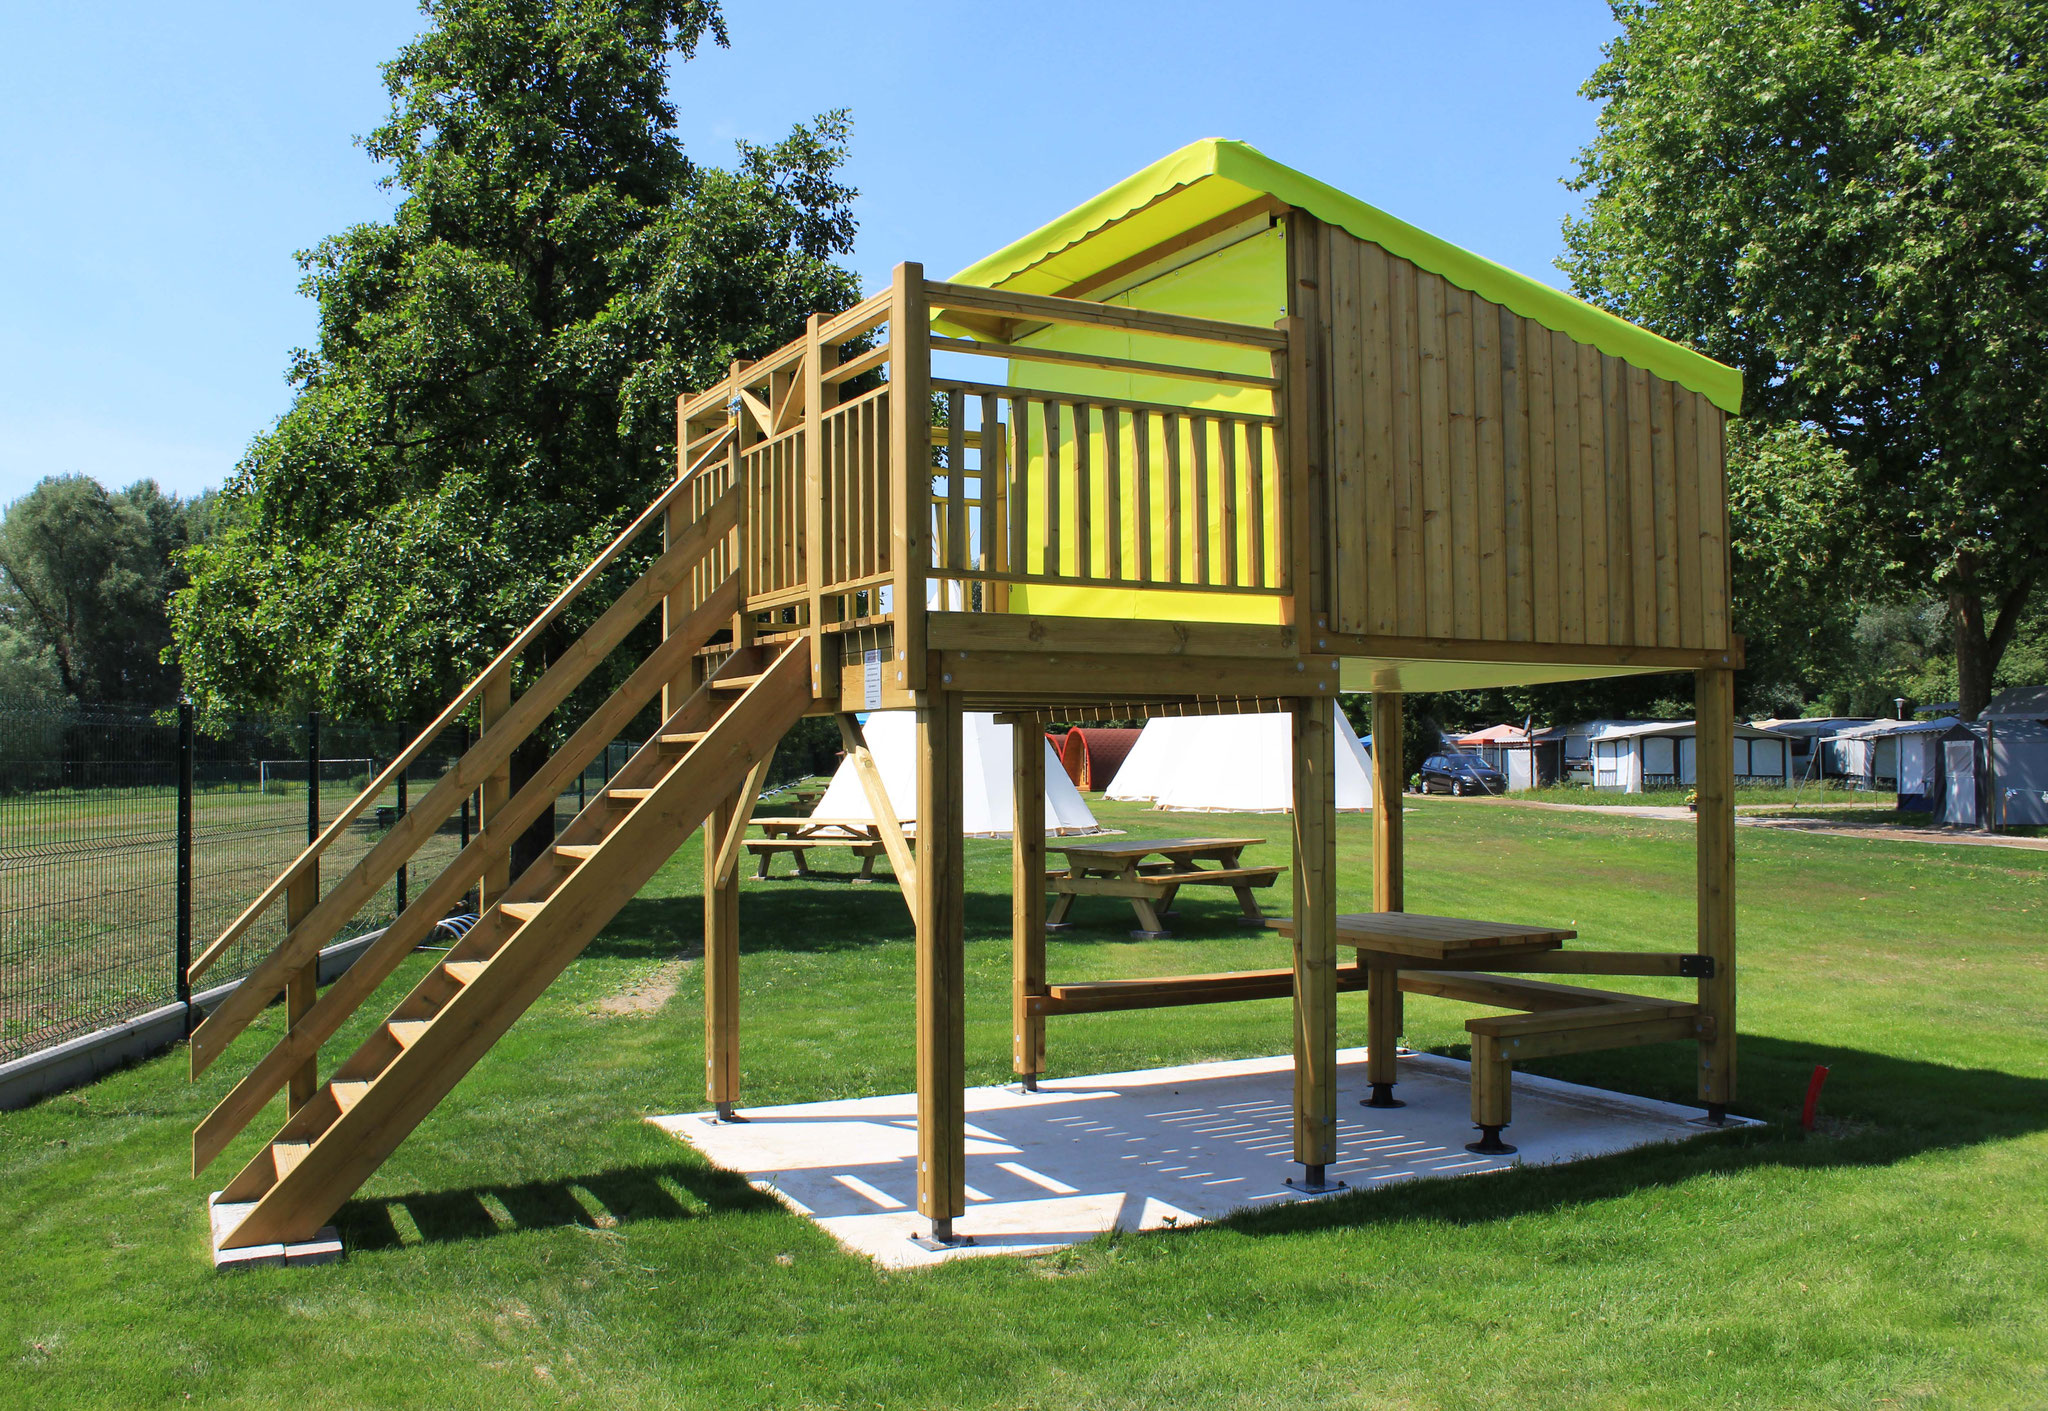 CAMP'ETOILE cabane en bois